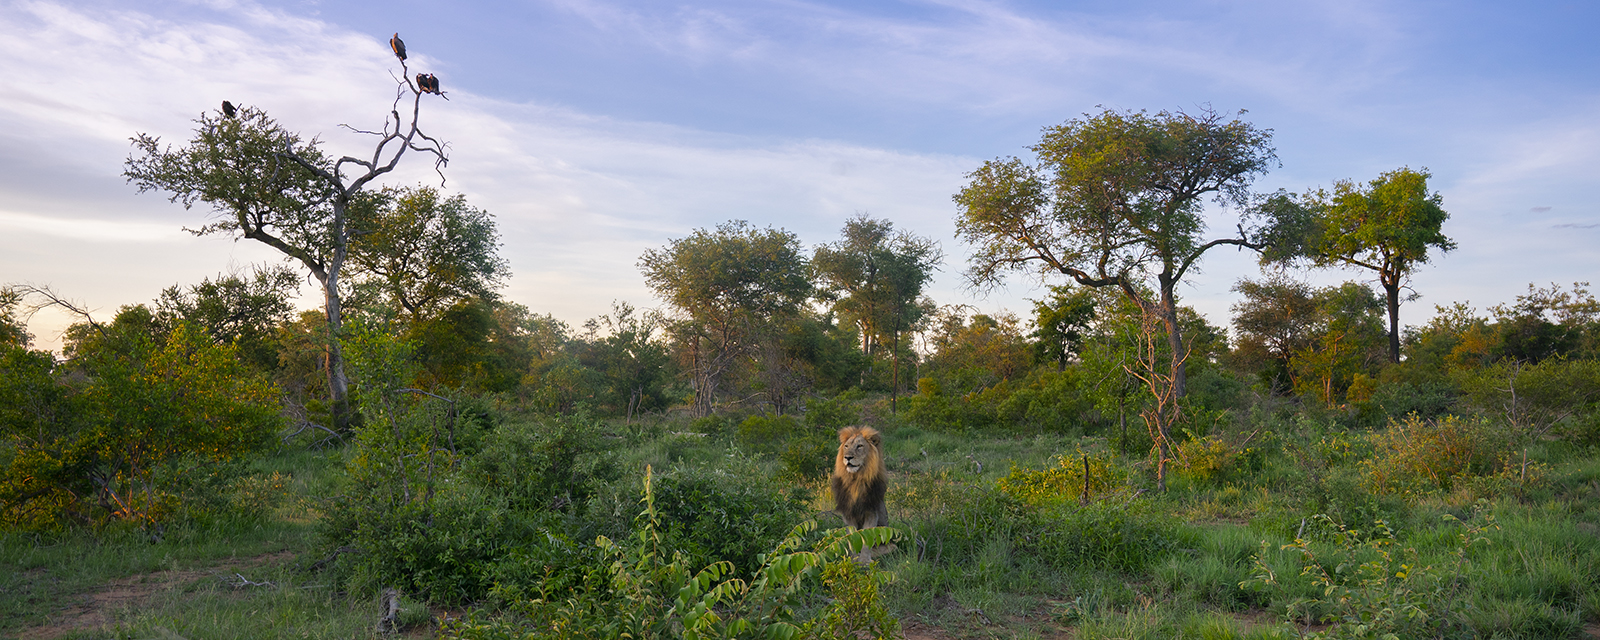 A Lion's magnificent mane absorbs the warm glow of sunset ashe keeps a keen eye on a herd of zebras not far away. A&nbsp...